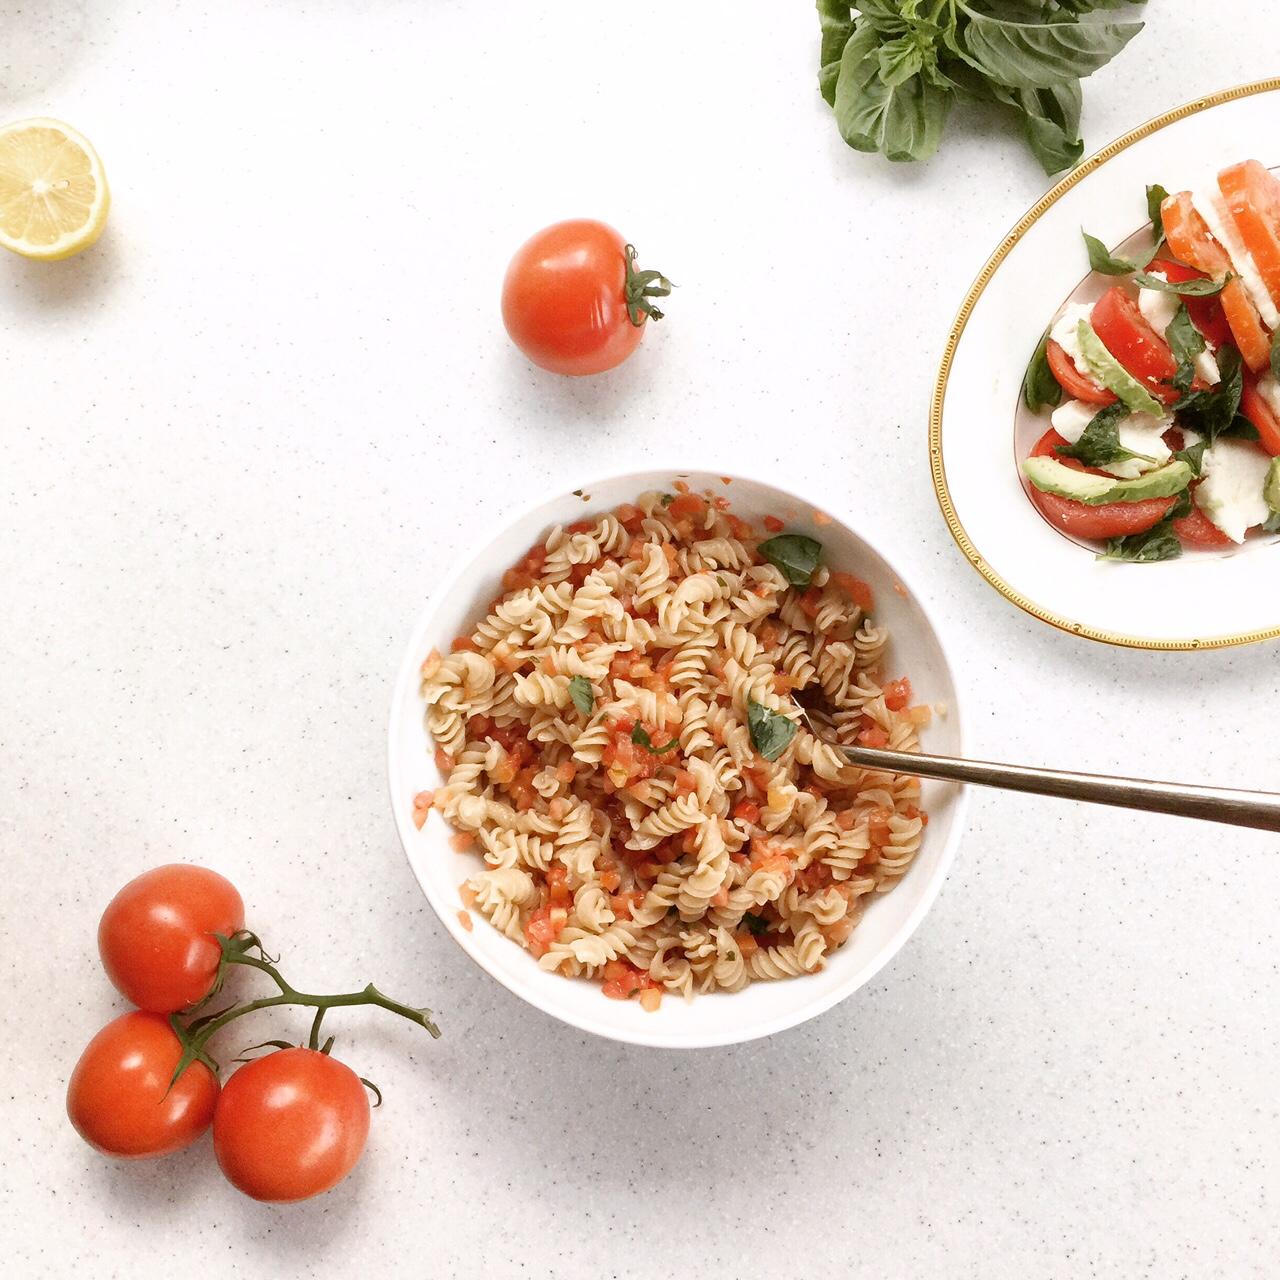 Gluten-free brown rice and quinoa pasta with bruschetta sauce